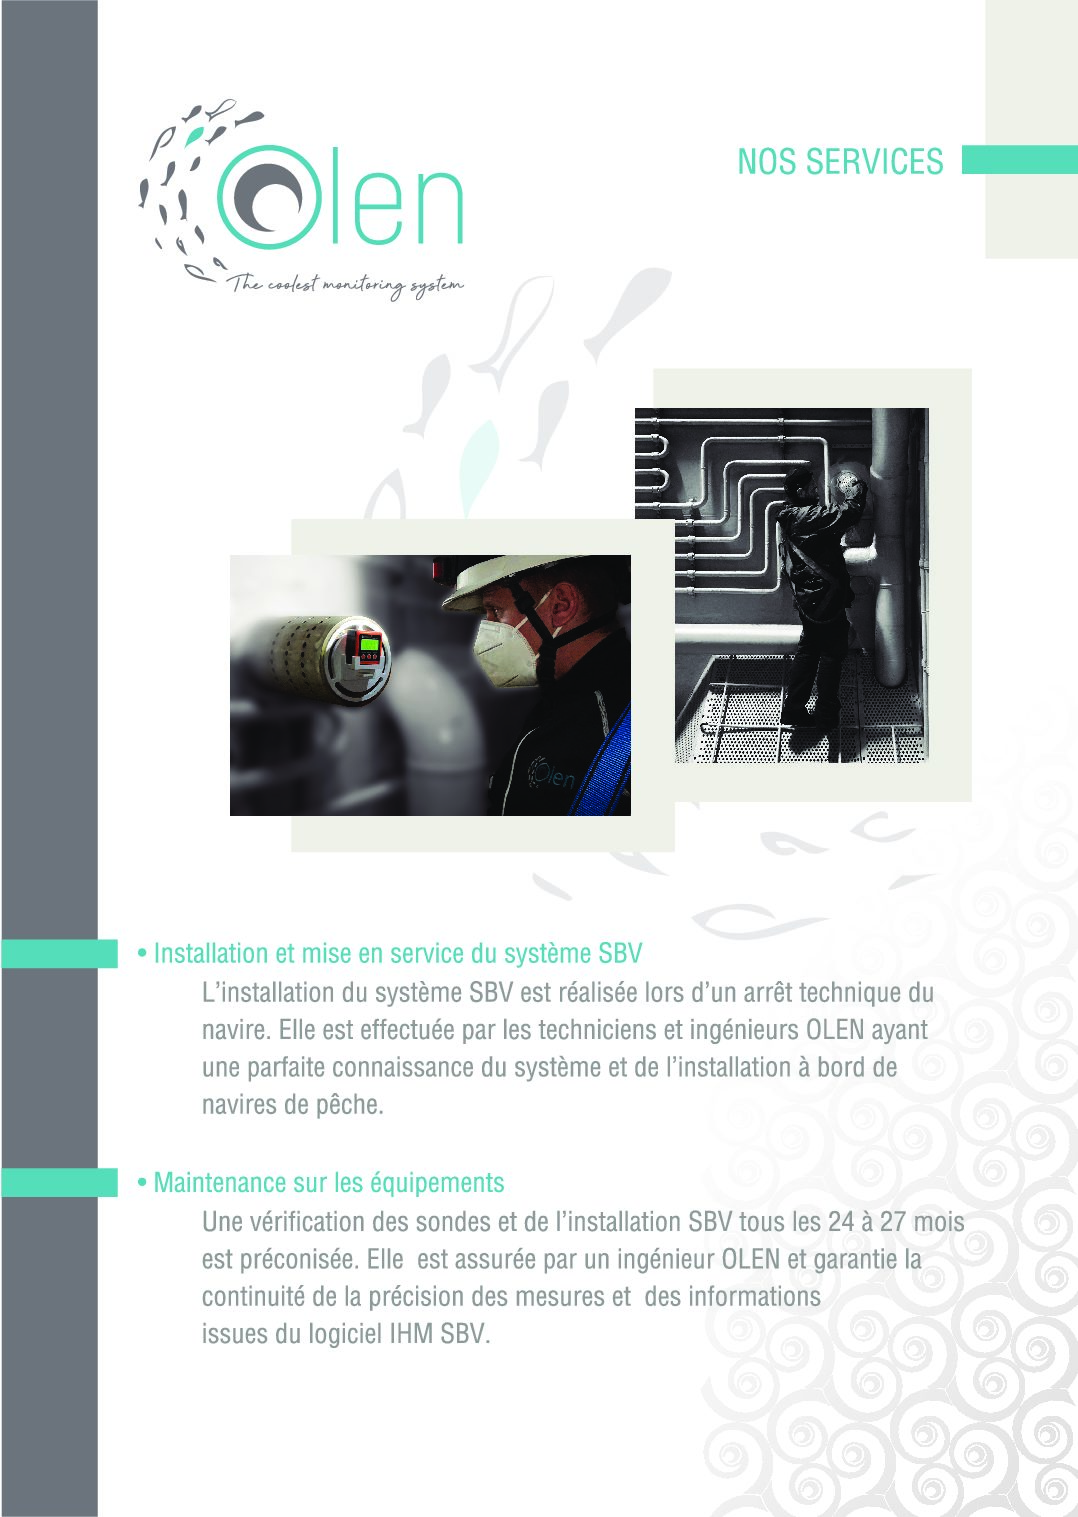 NOS SERVICES FR pdf - Services